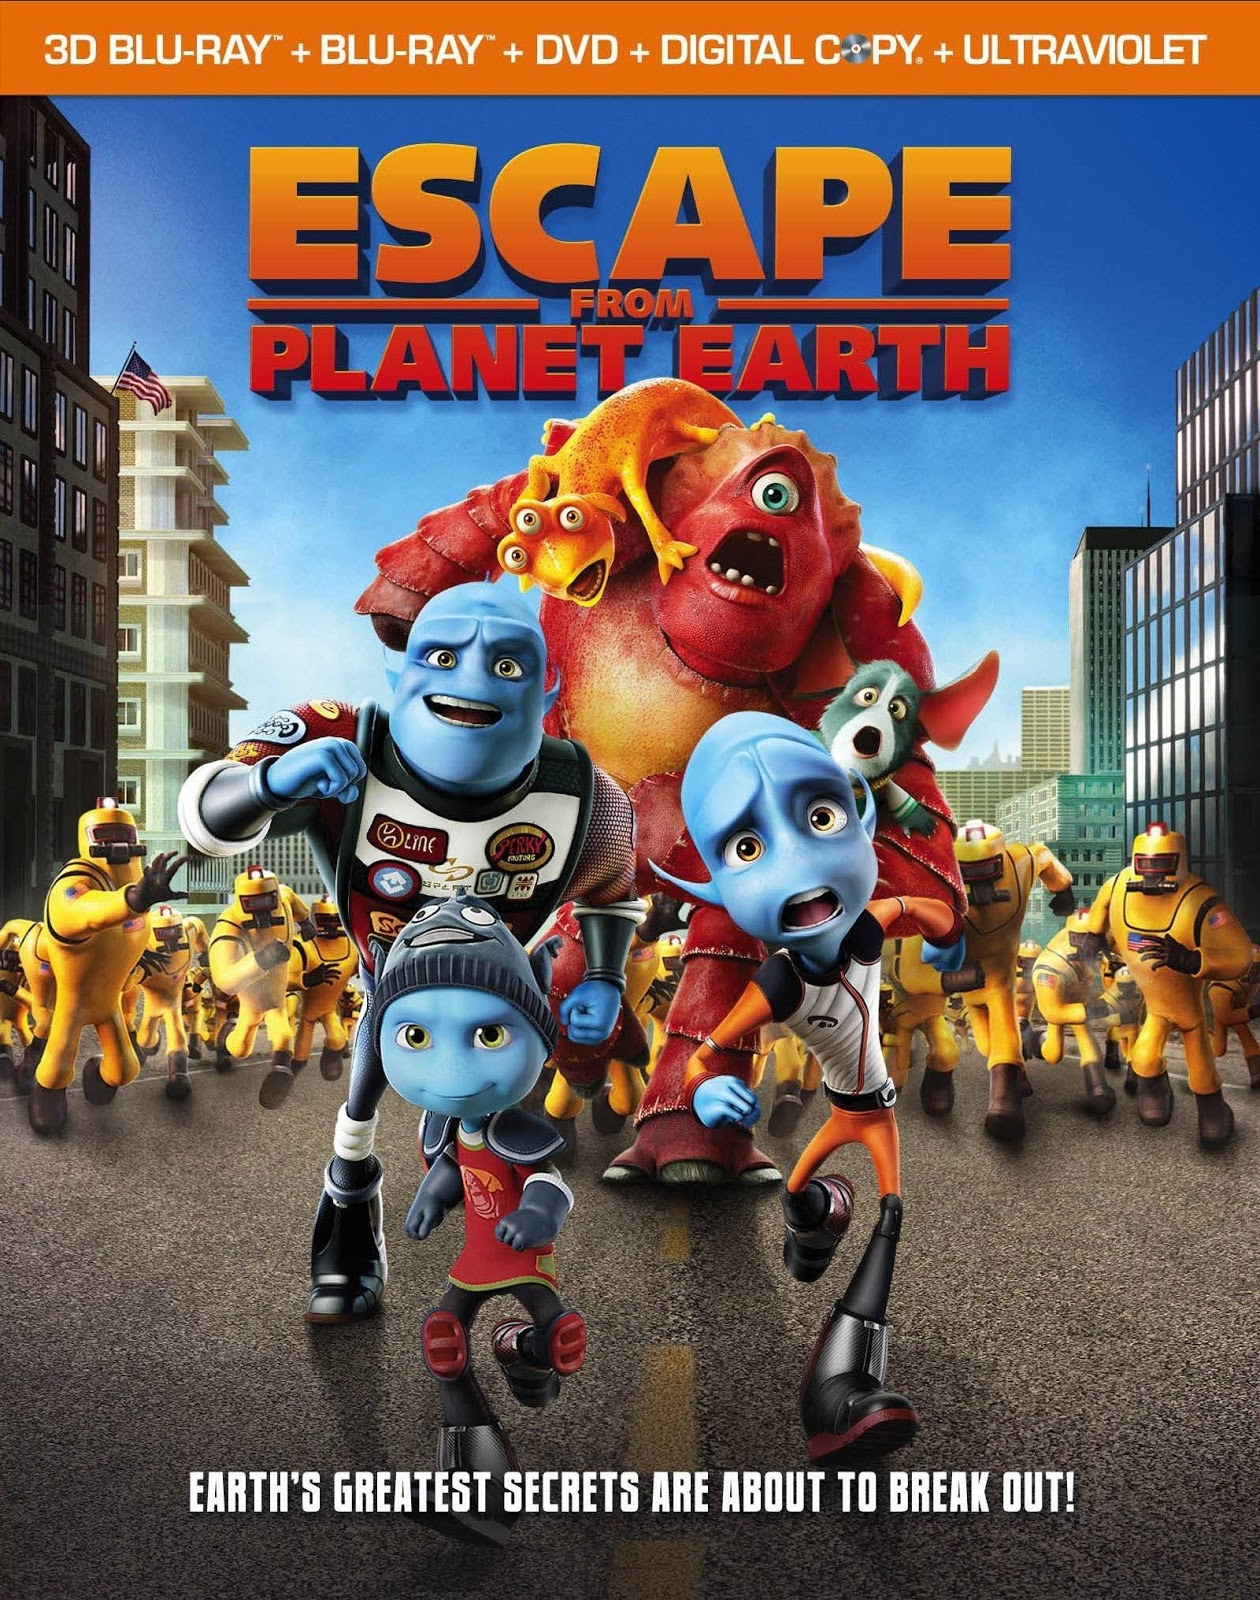 Escape From Planet Earth 2013 - Thoát Khỏi Trái Đất [hd]